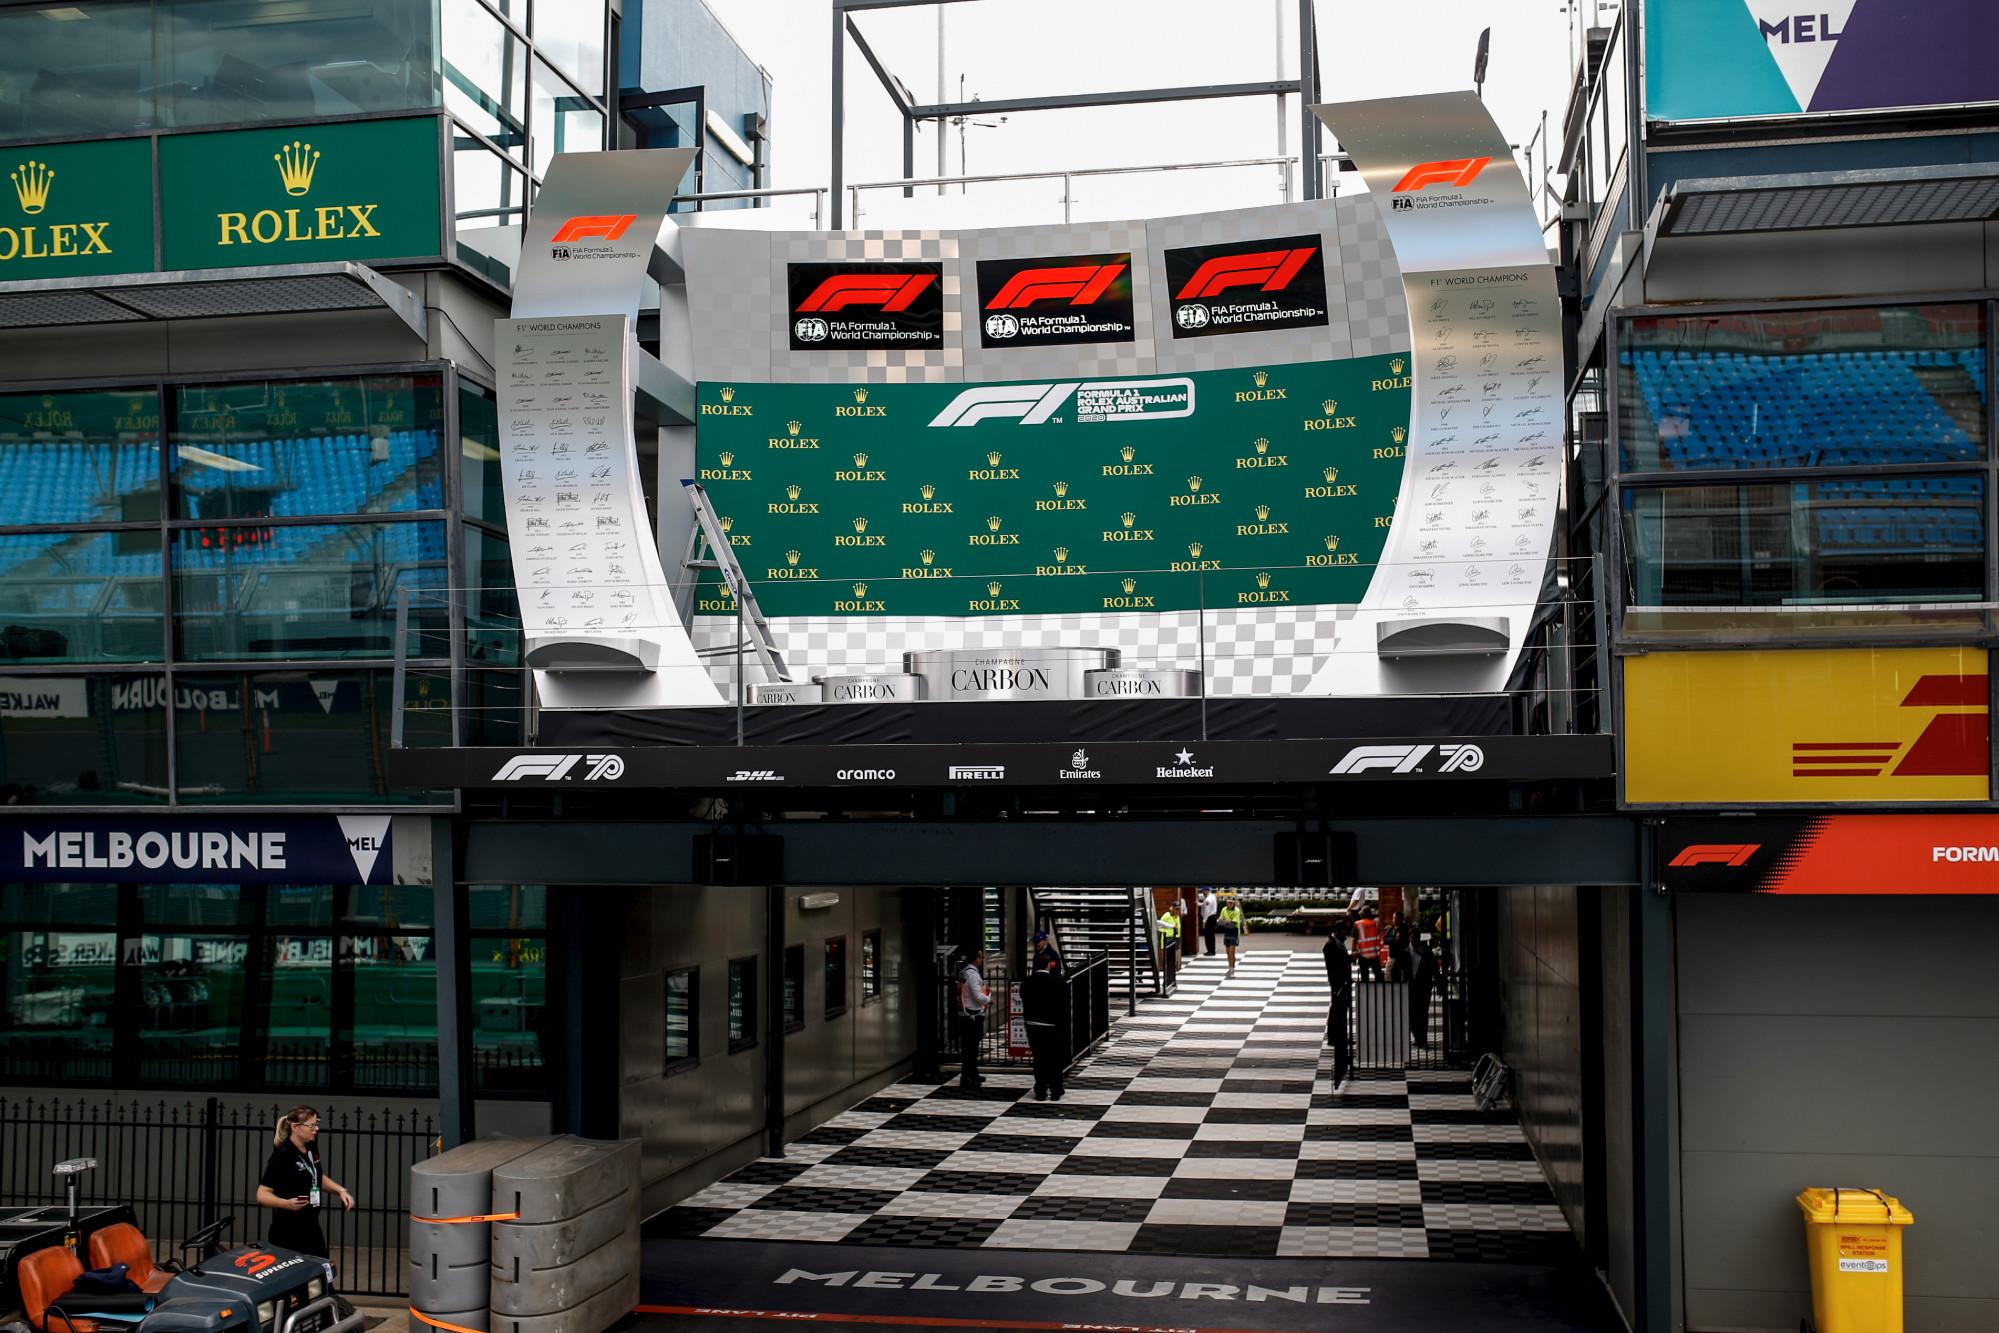 Formula 1 extends summer shutdown into May